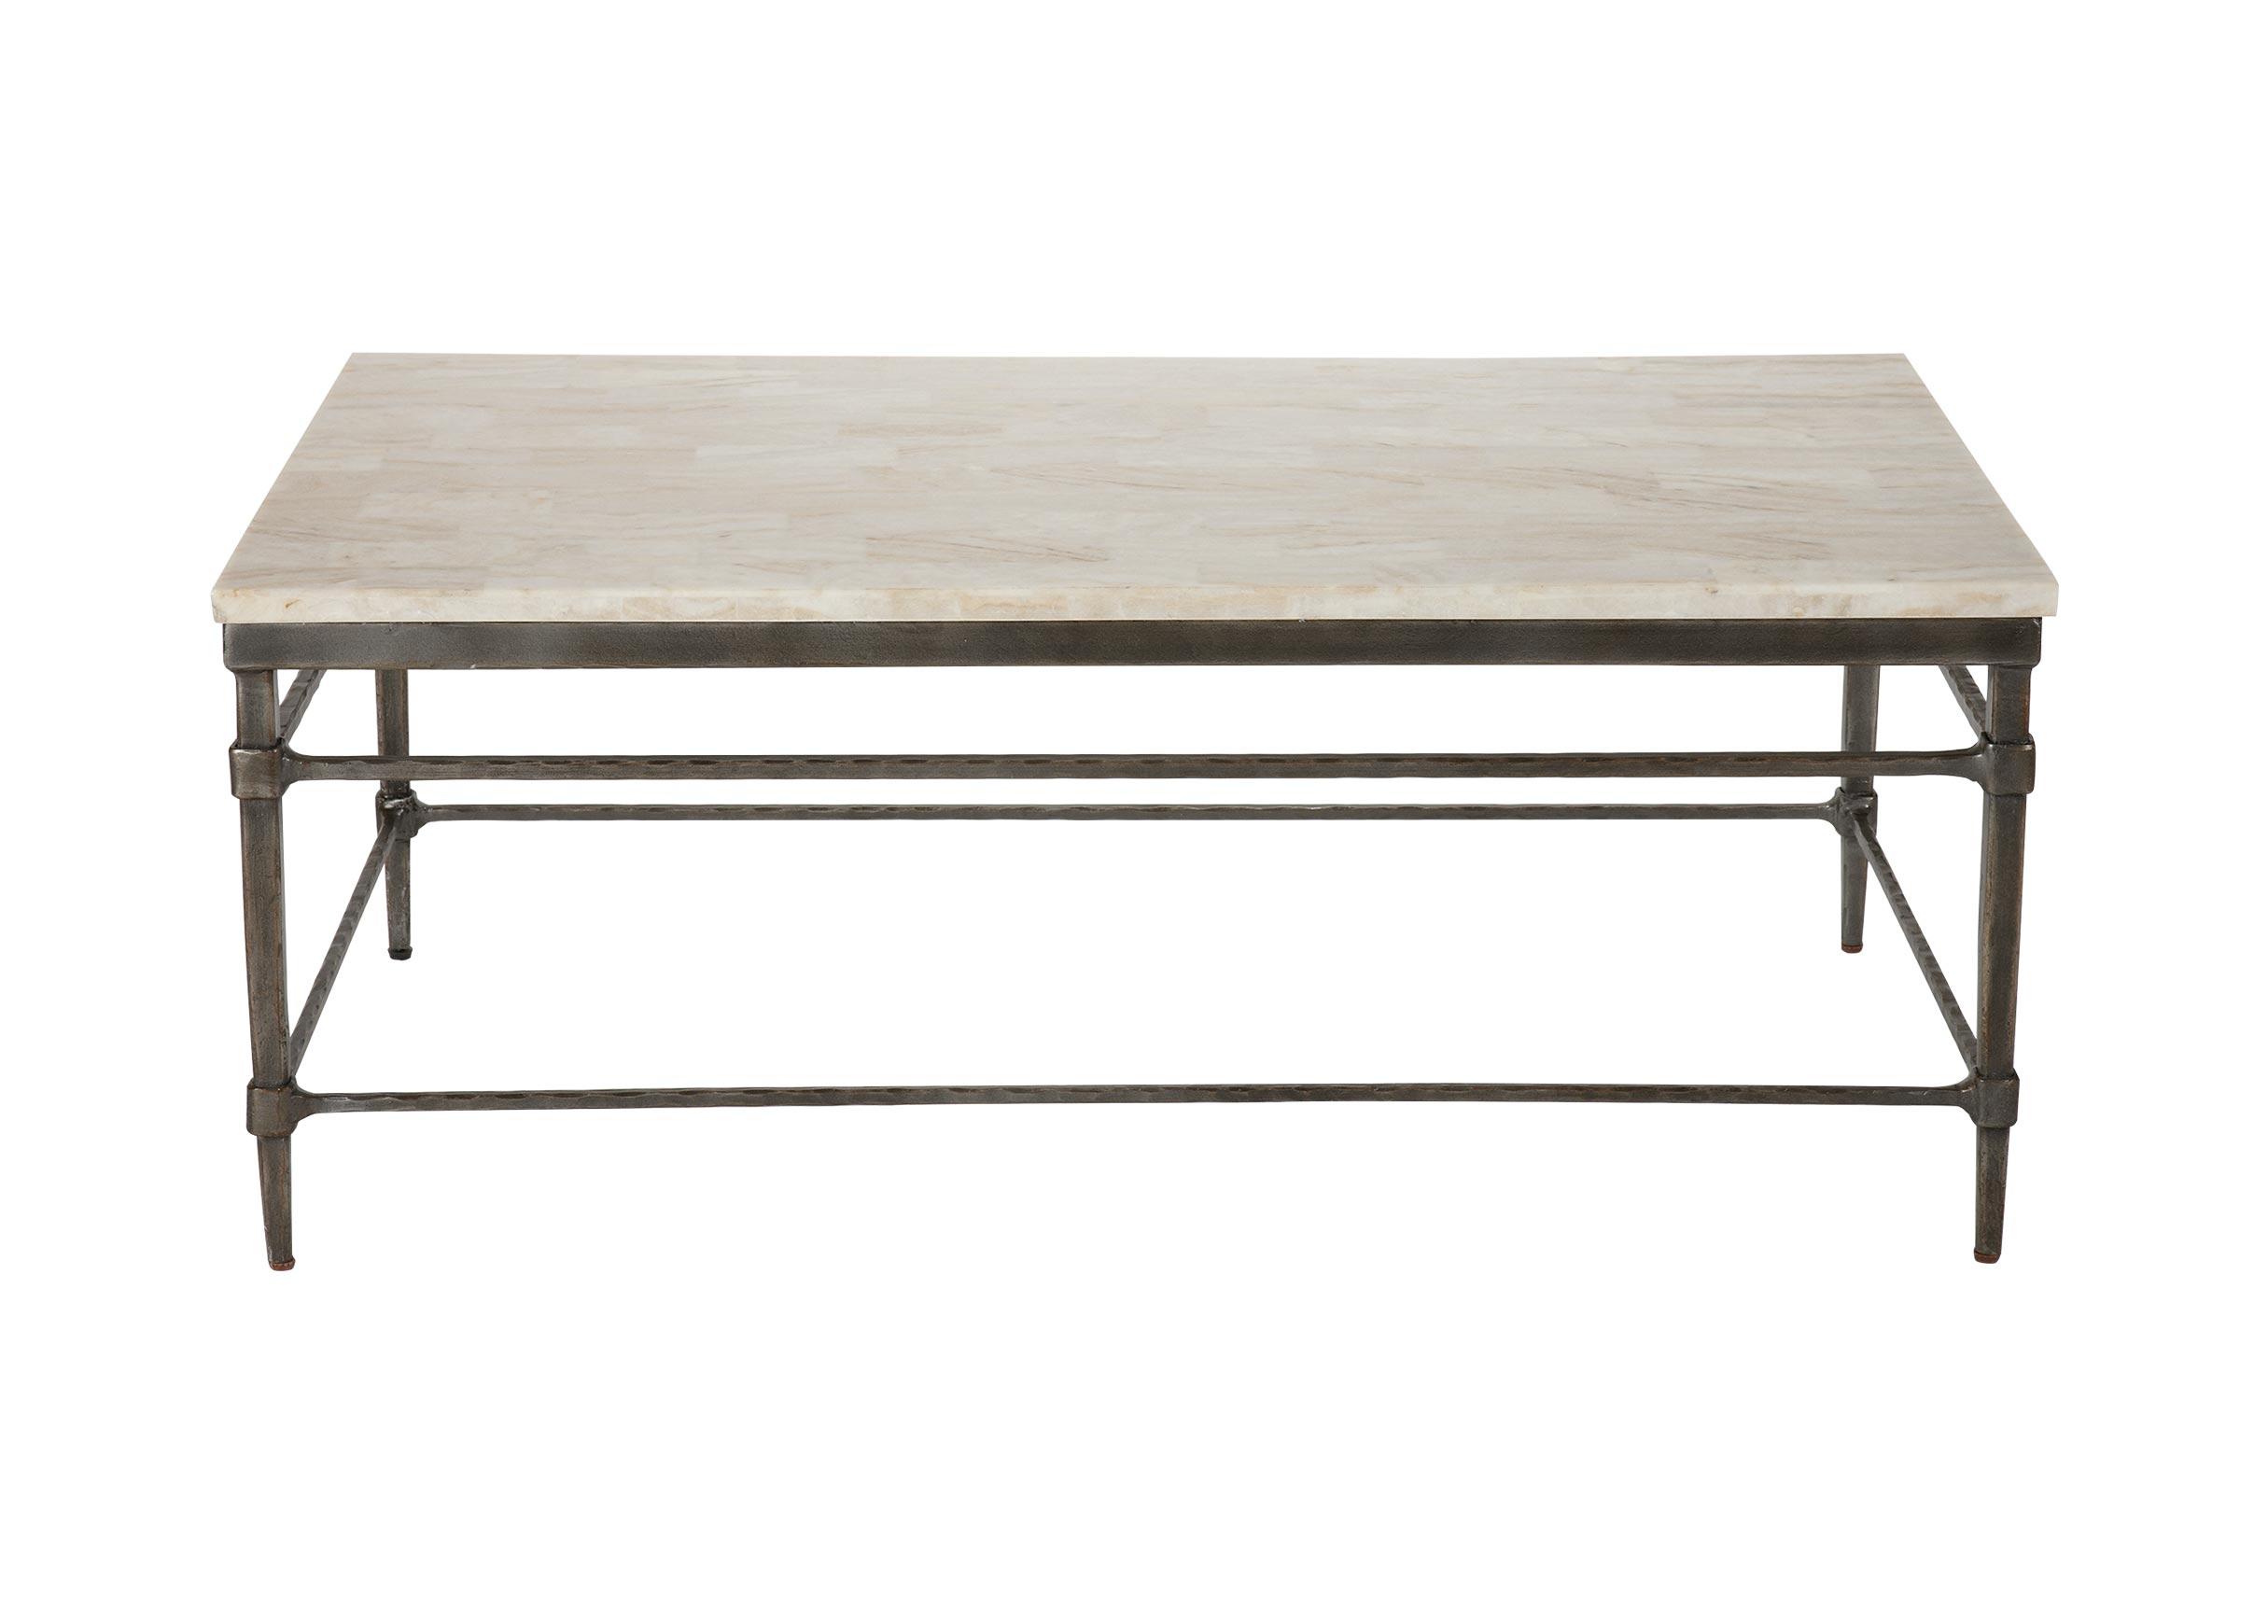 Top Vida Stone-Top Coffee Table   Coffee Tables   SiteGenesis   101.1  OB98